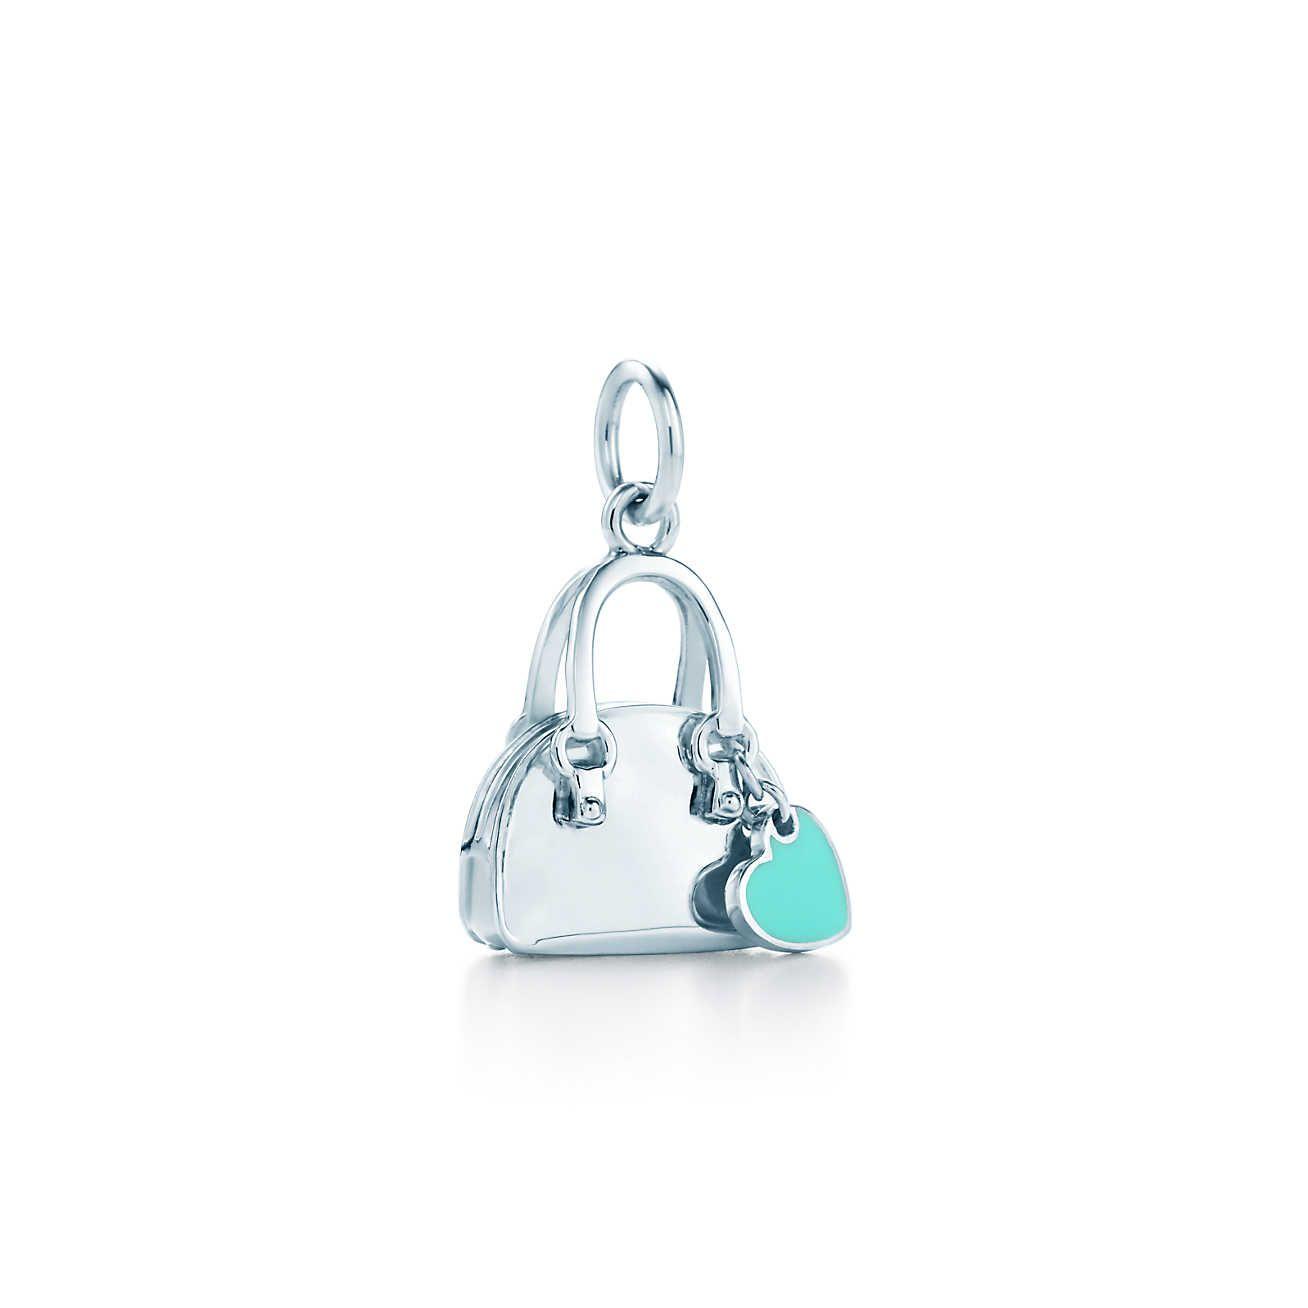 Handbag Charm In Sterling Silver With Tiffany Blue Enamel Finish Co